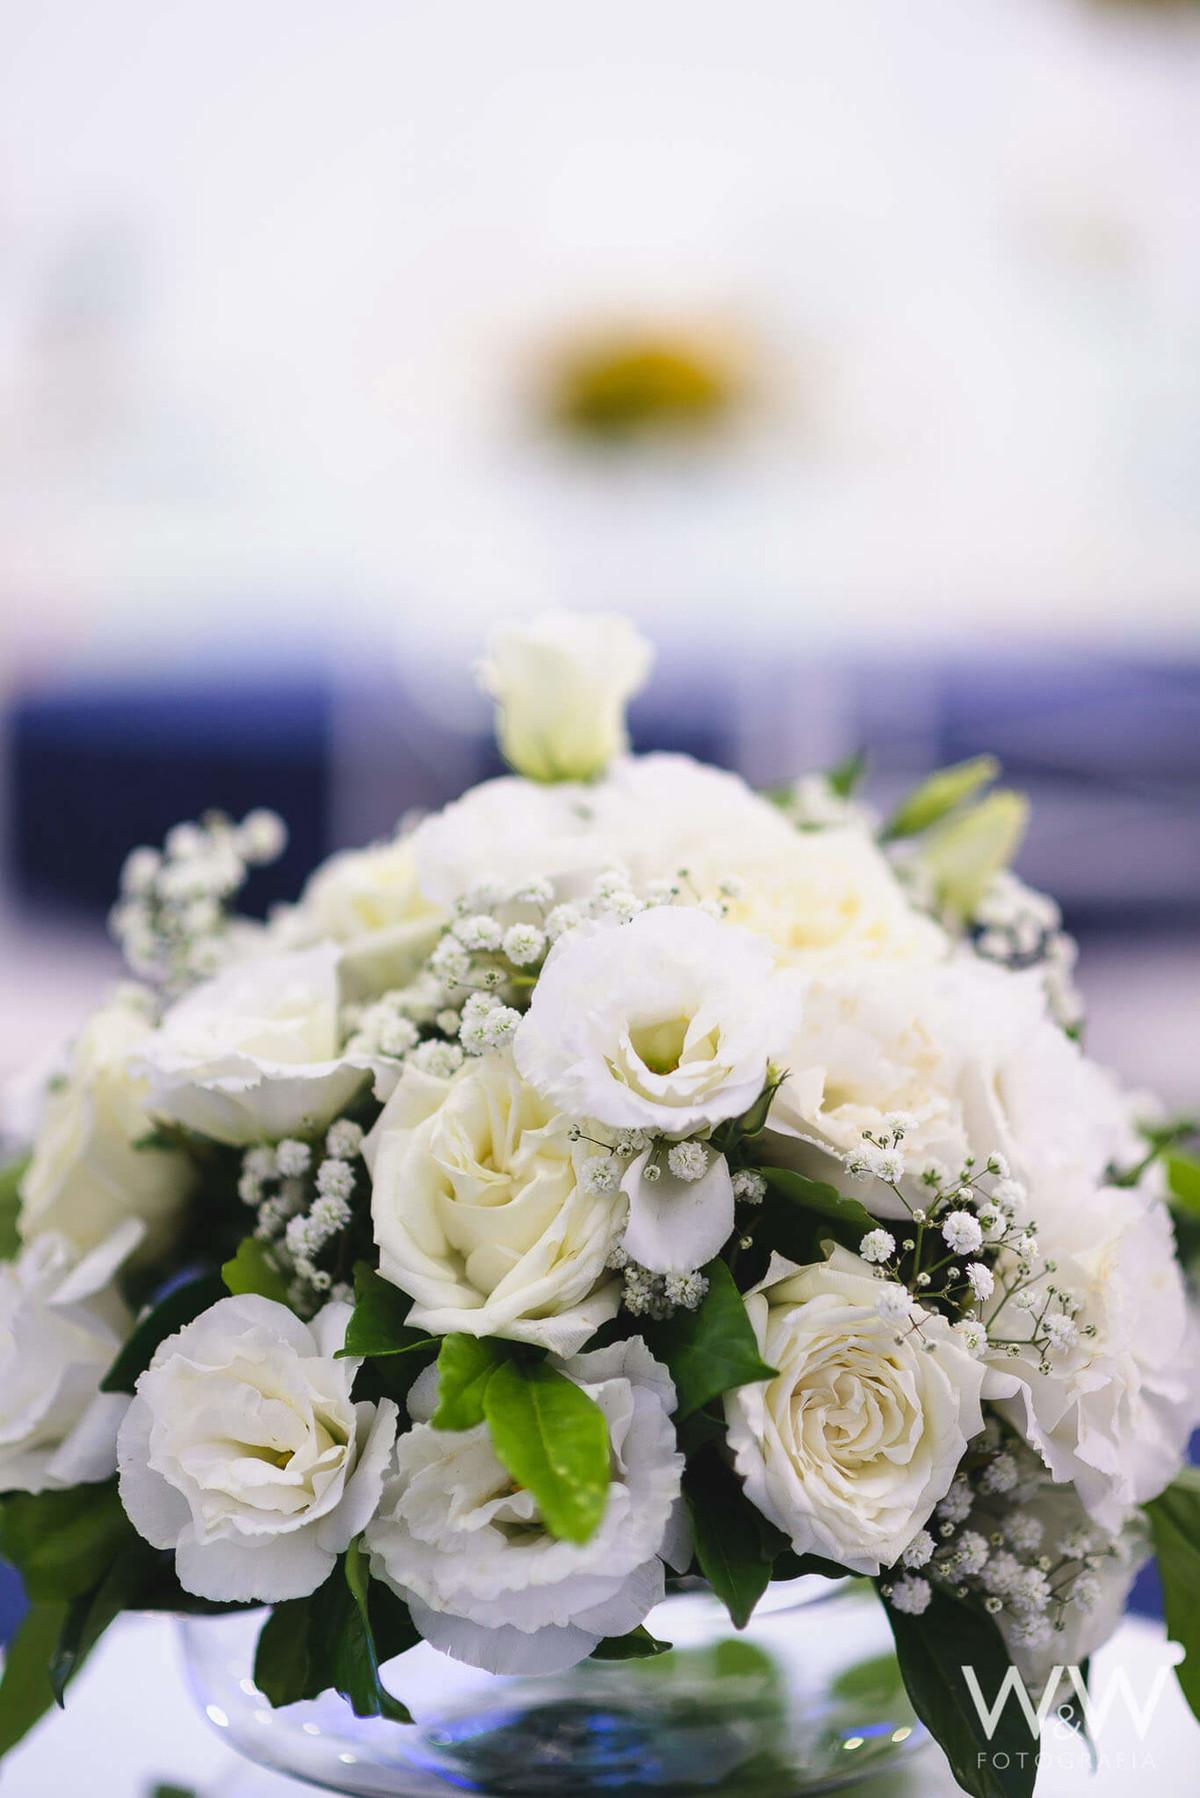 buffet orquidea casamento sp arranjo decoracao